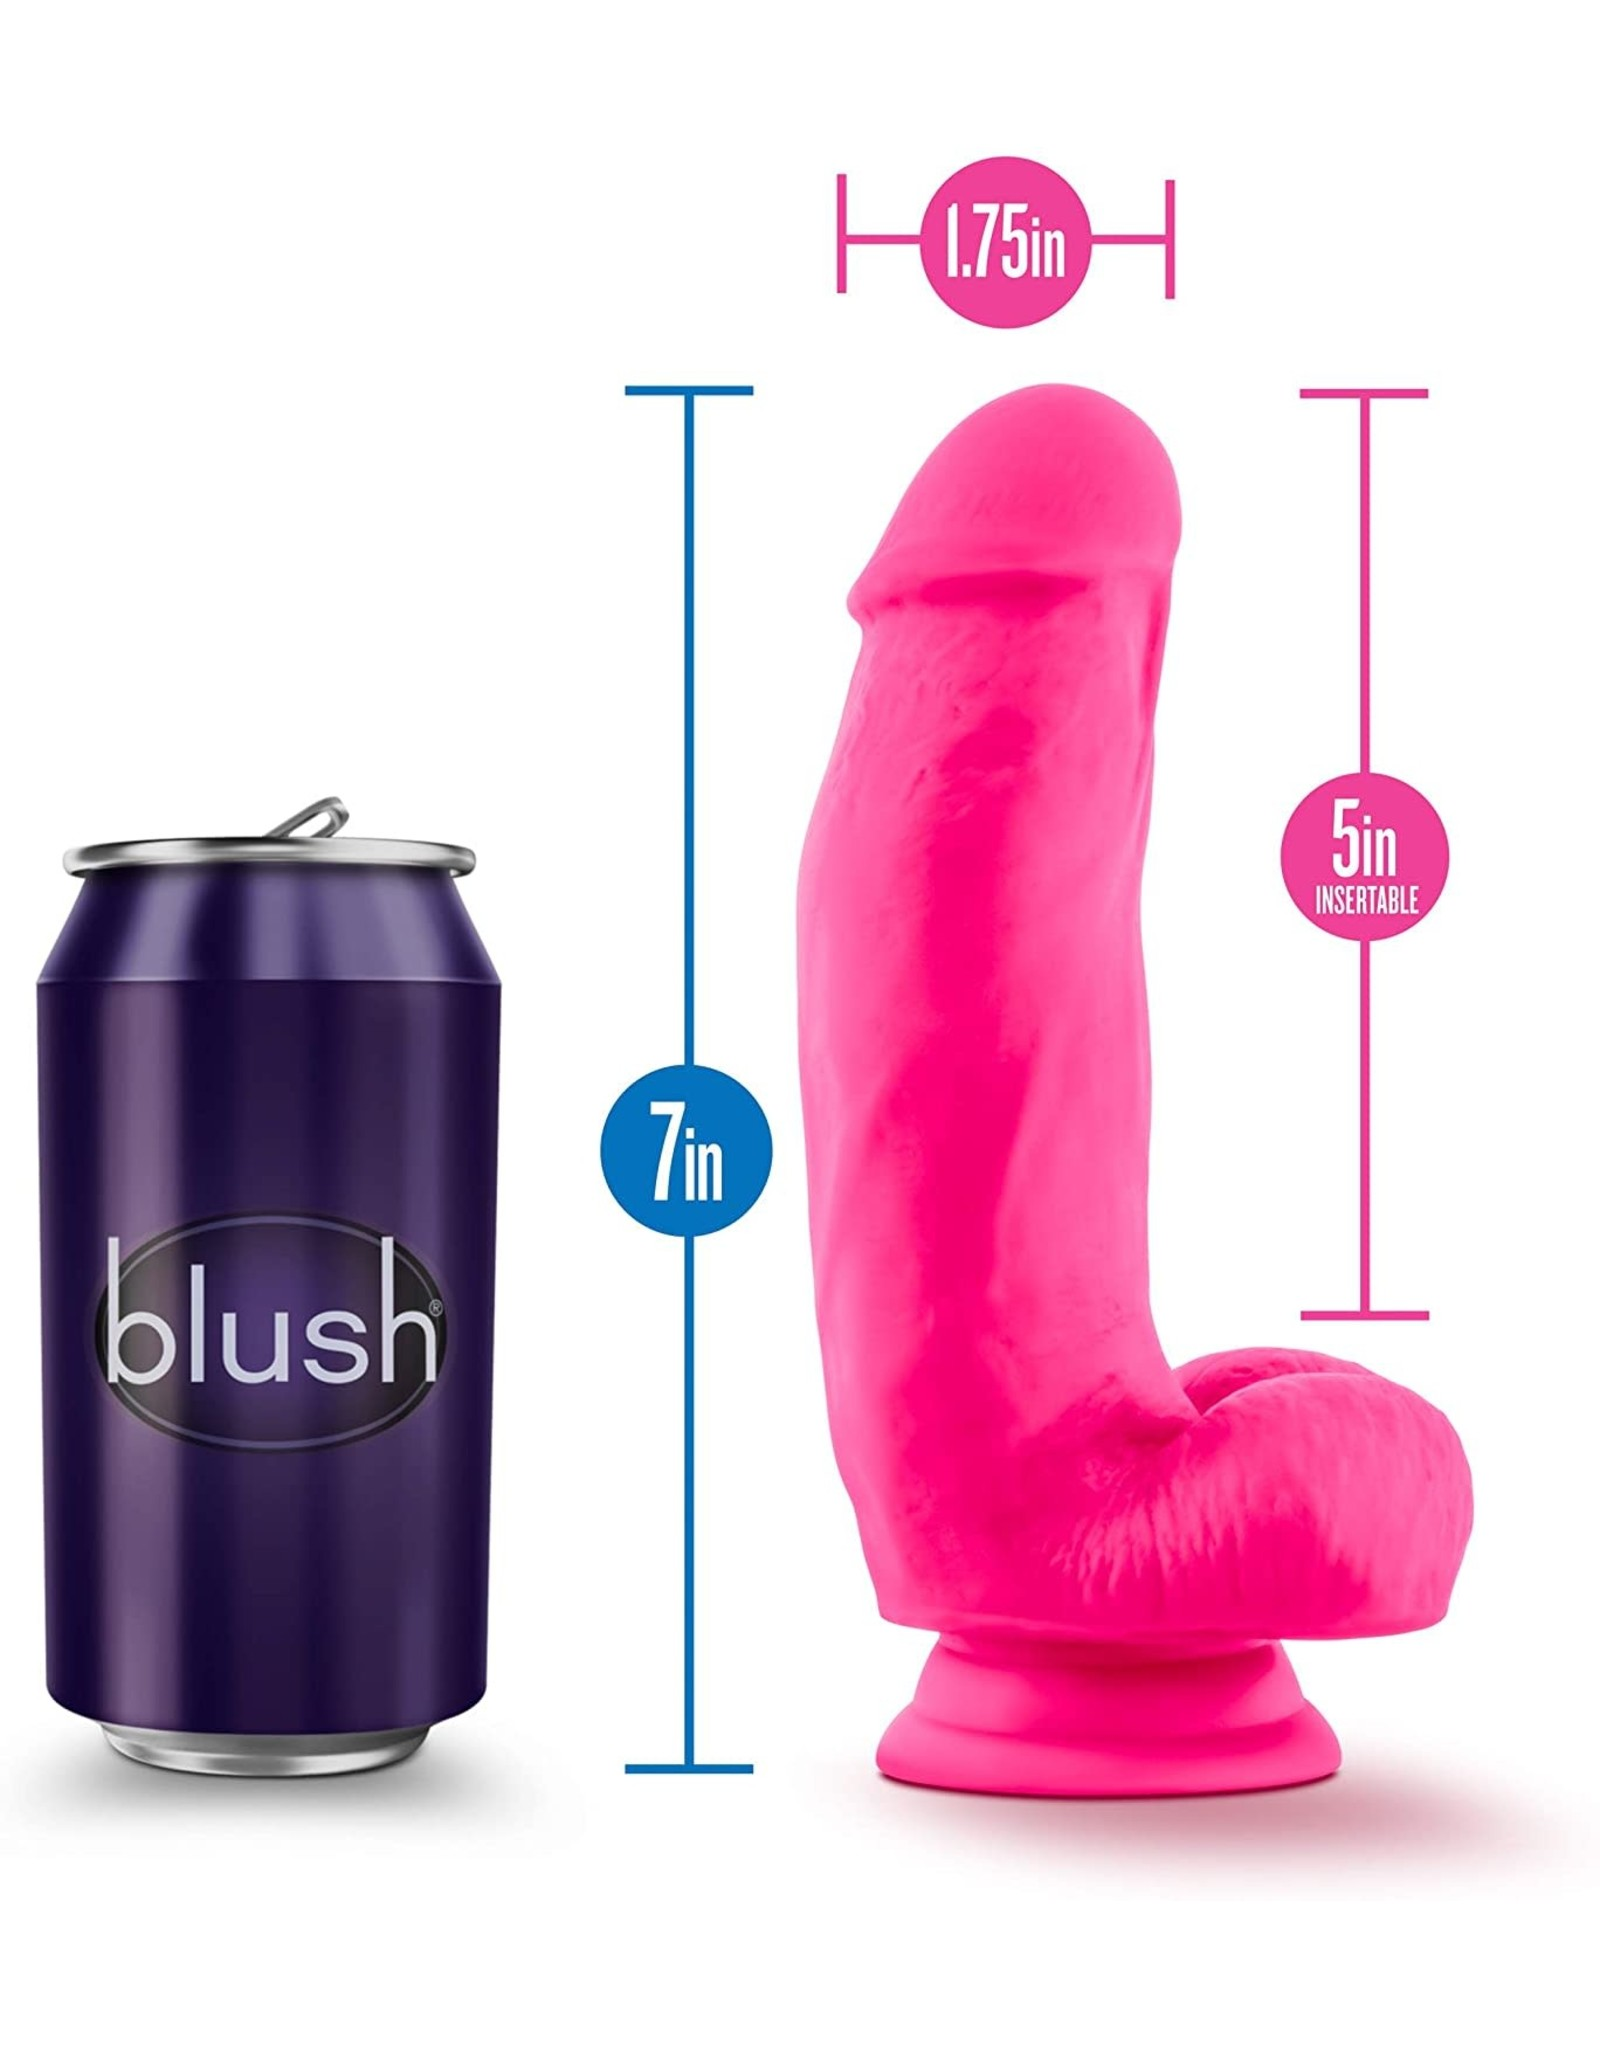 BLUSH BLUSH - NEO ELITE - 7' SILICONE DUAL DENSITY COCK W BALLS - NEON PINK